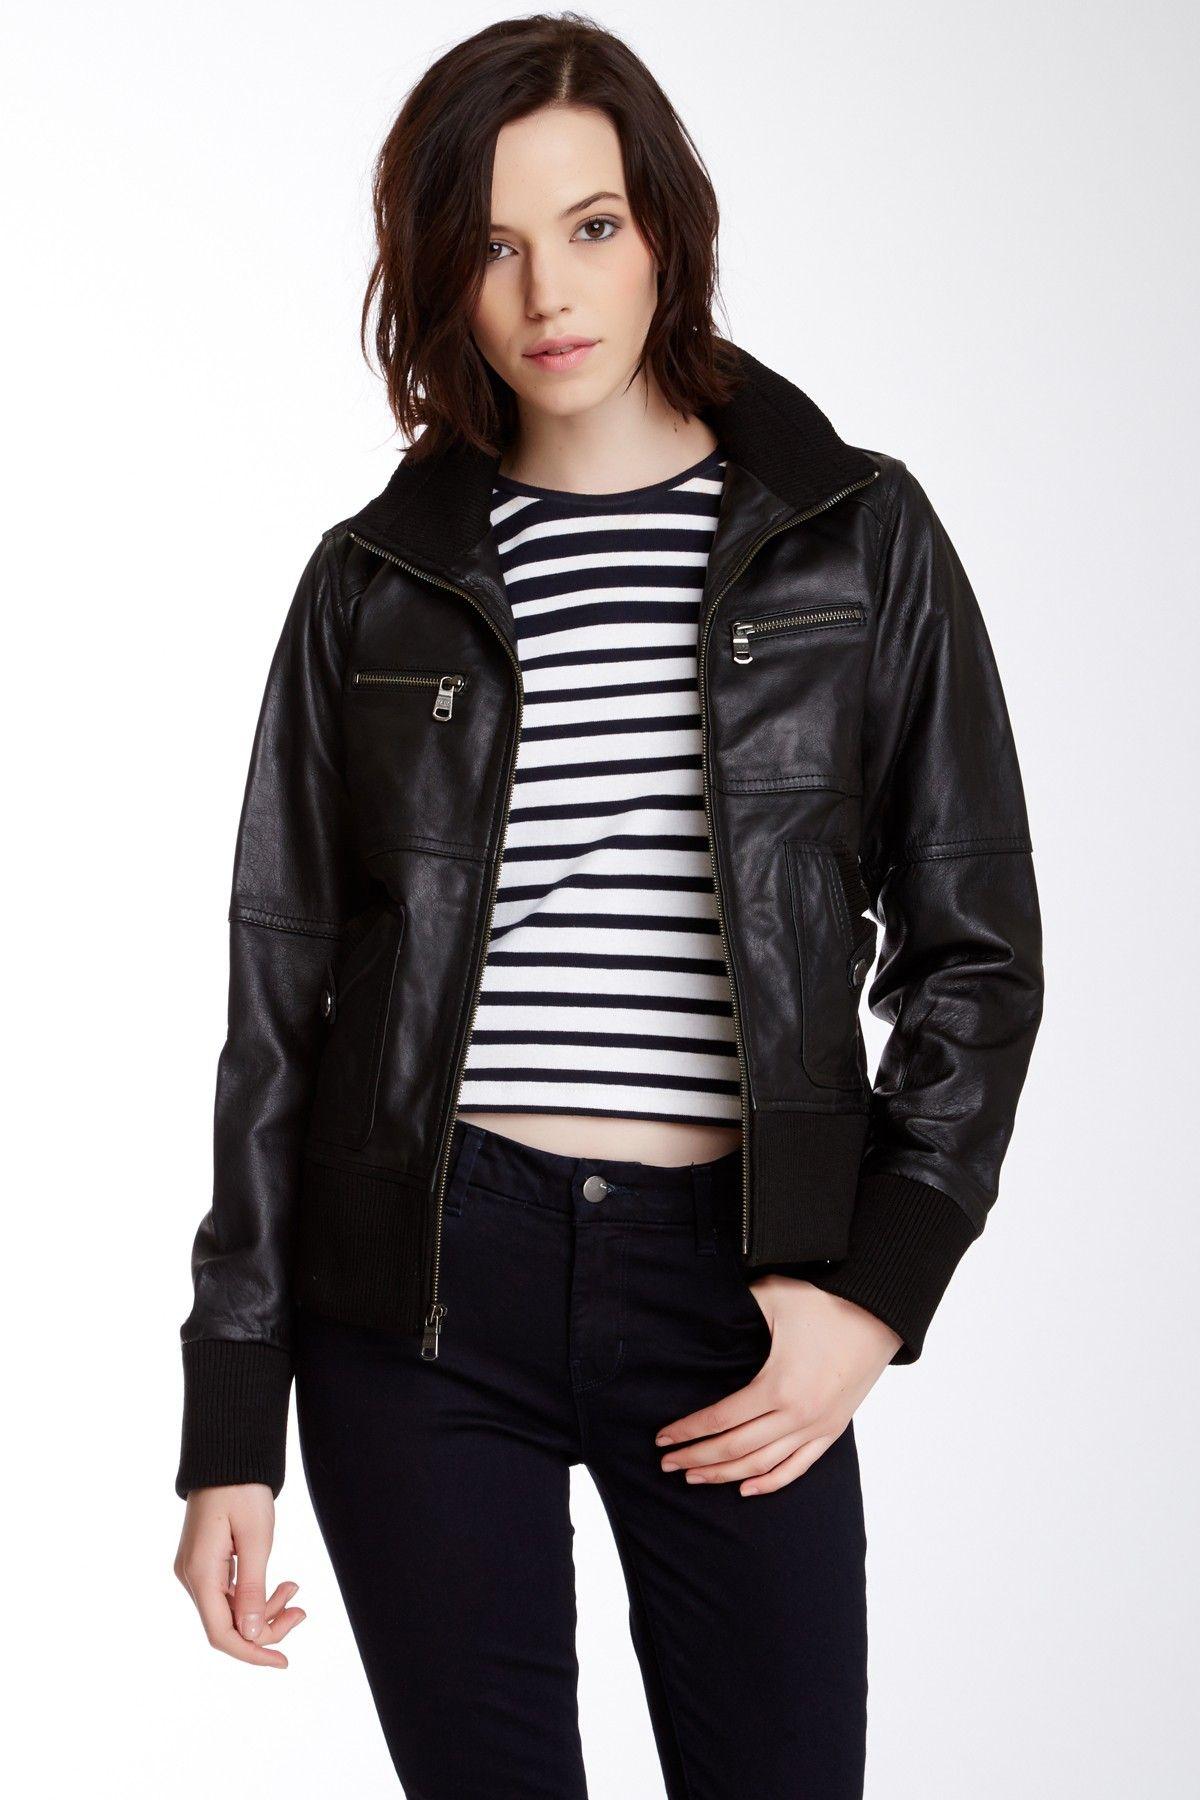 Andrew Marc Scarlett Leather Jacket Leather jacket